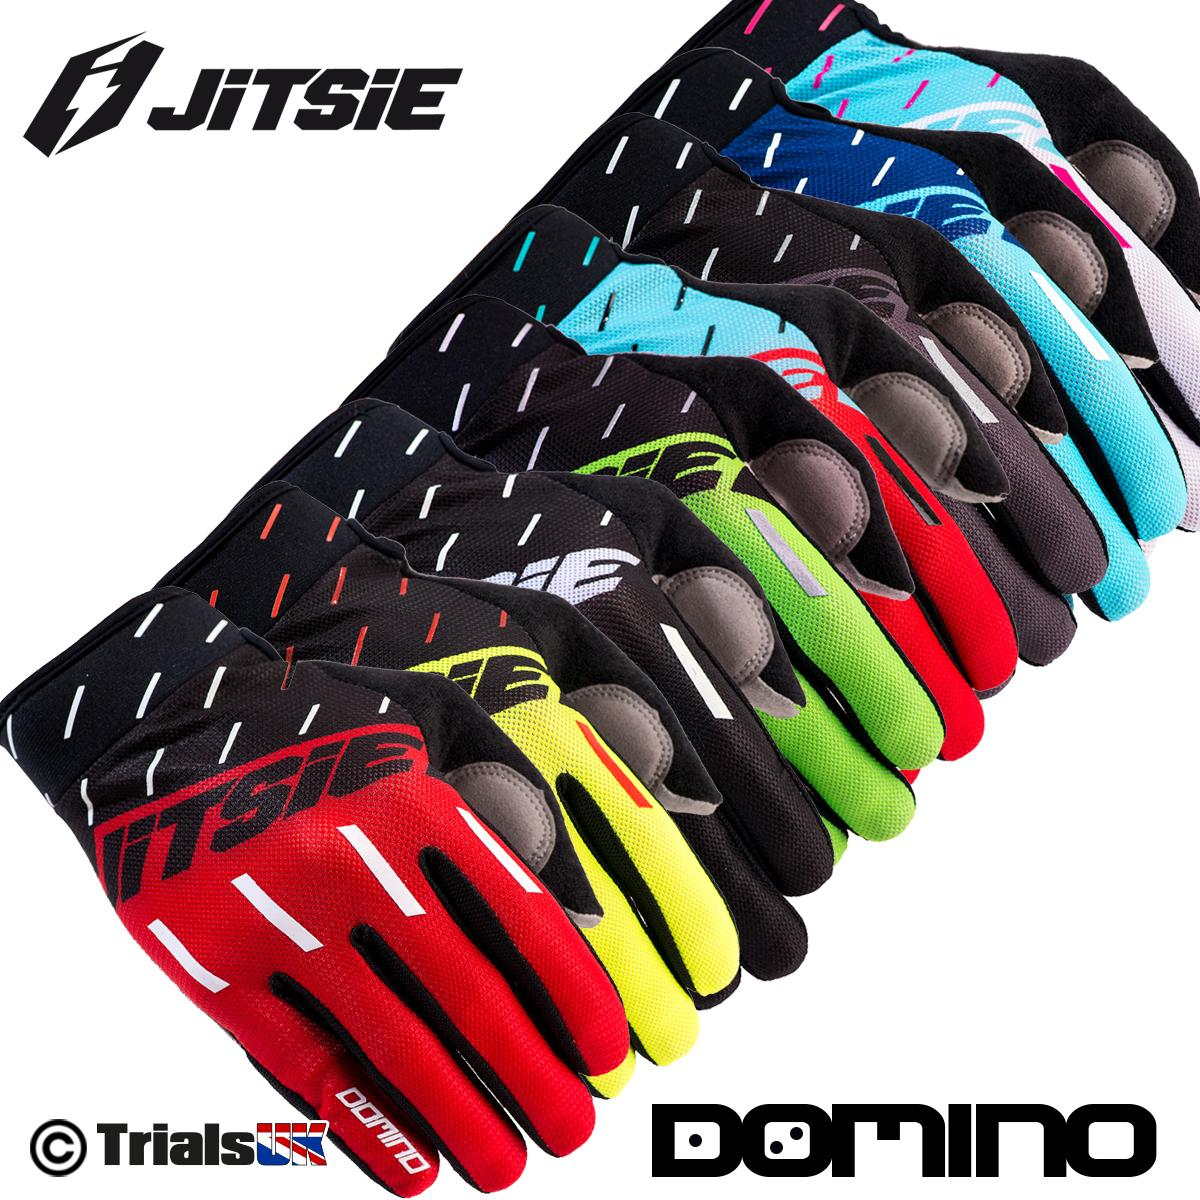 Jitsie Domino Race Fit Trials Gloves Professional Offroad Standard